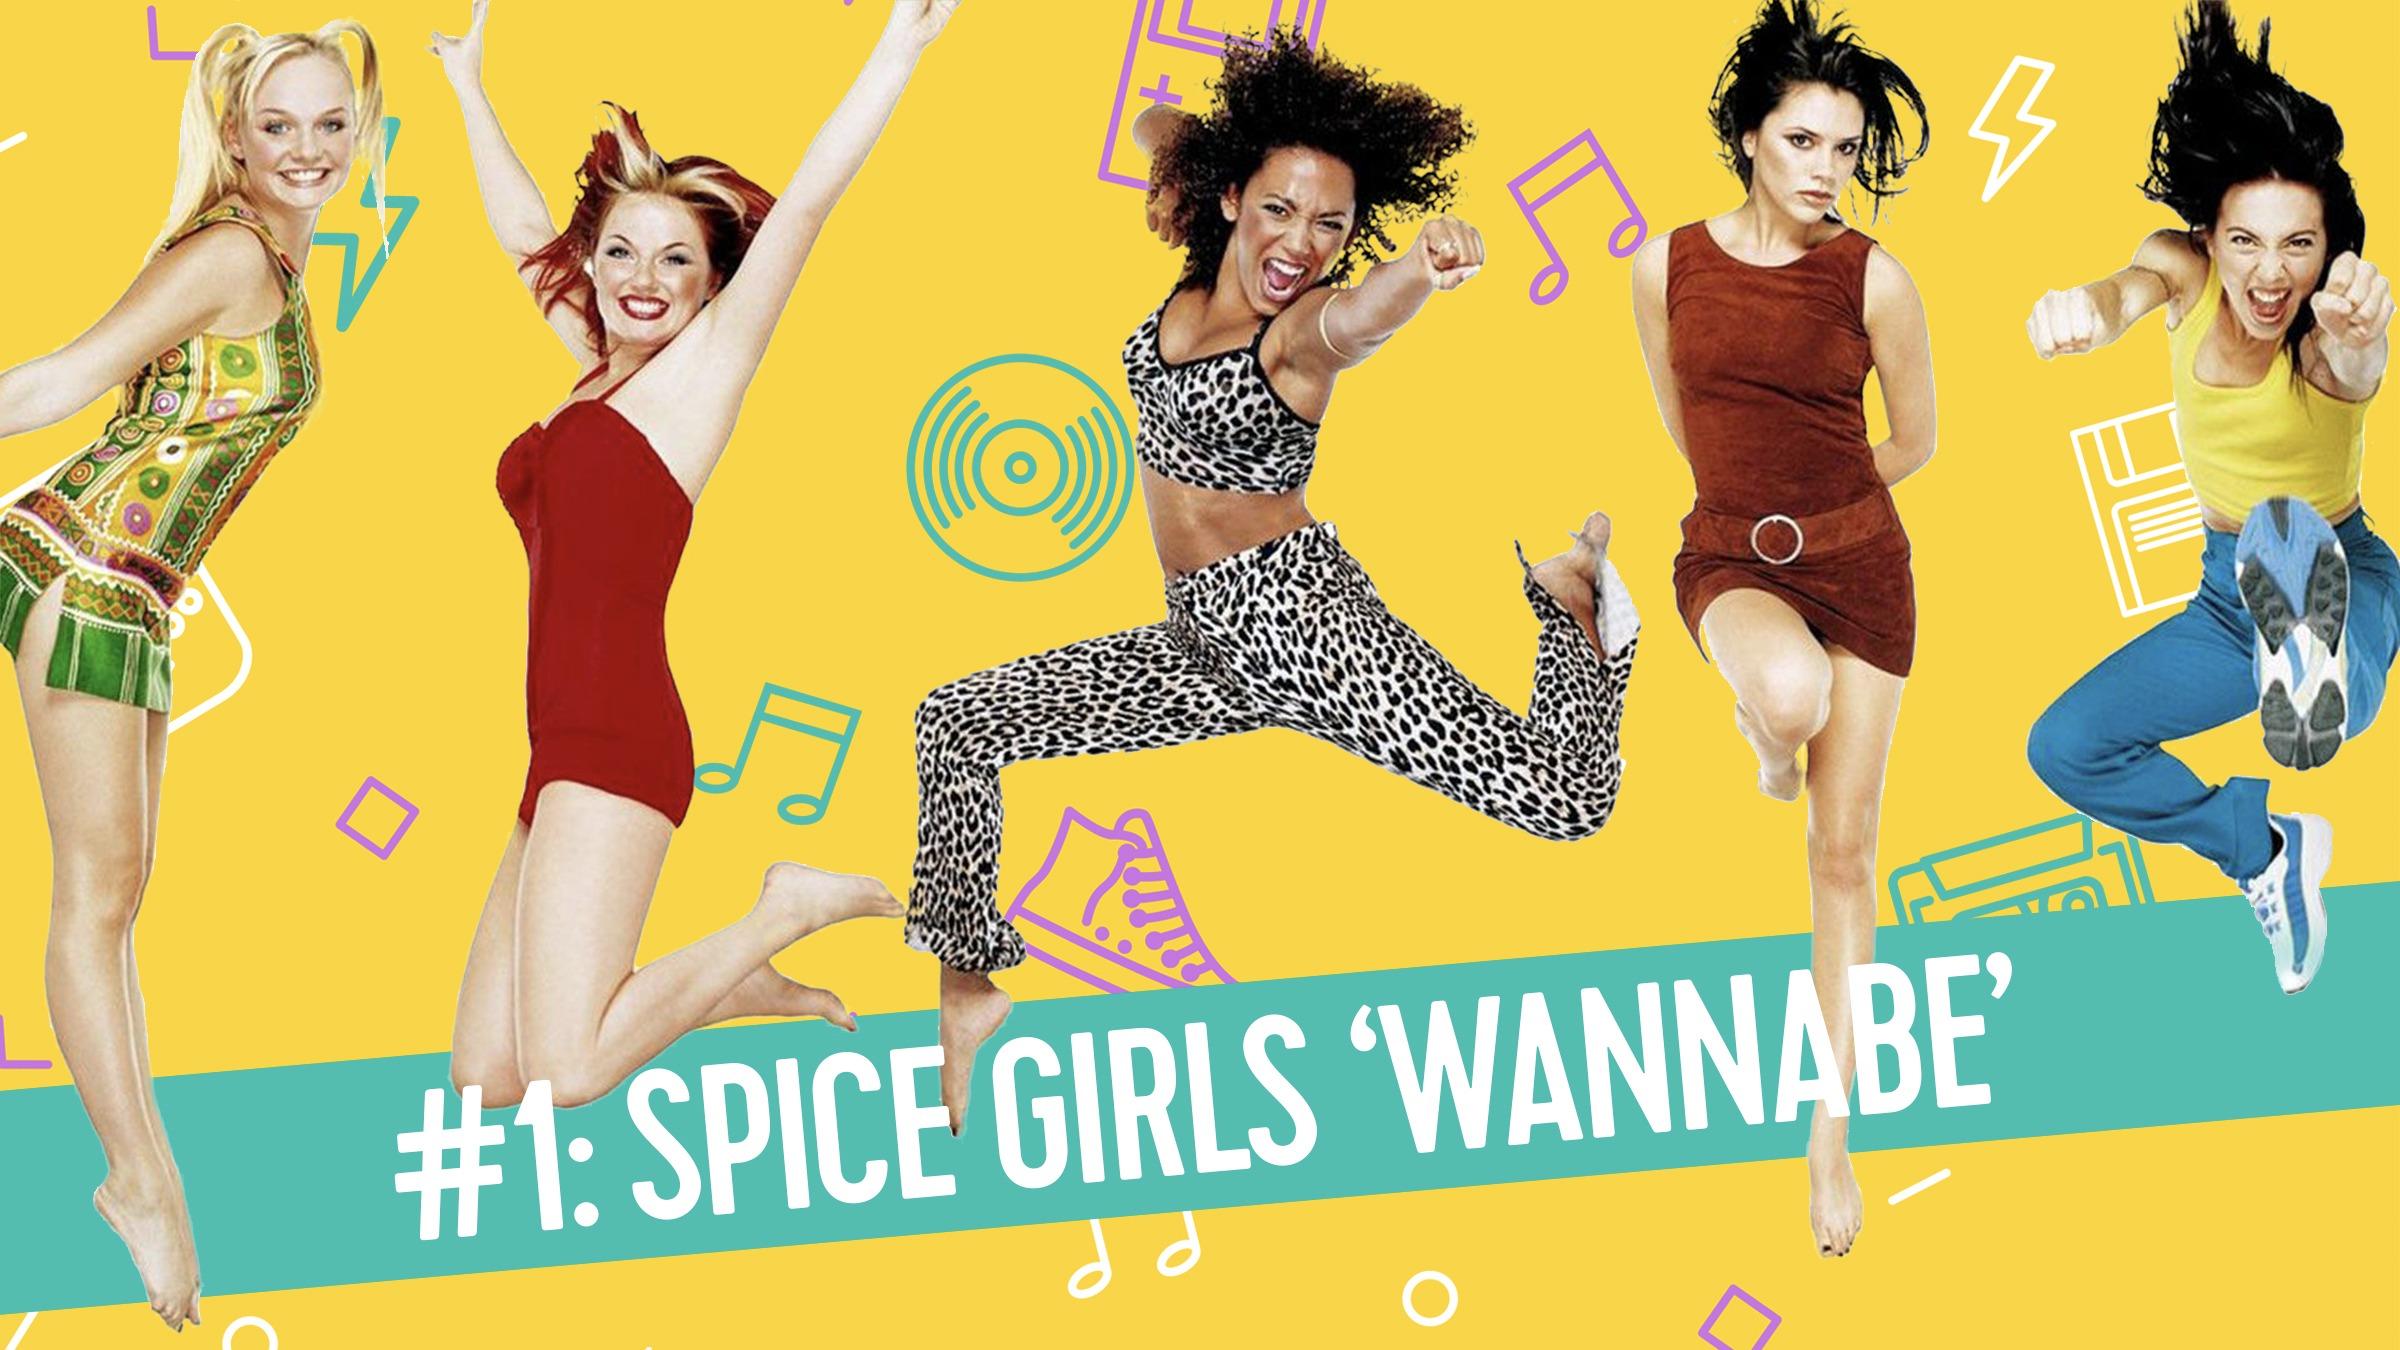 190301   mijlpaal   spice girls   wannabe